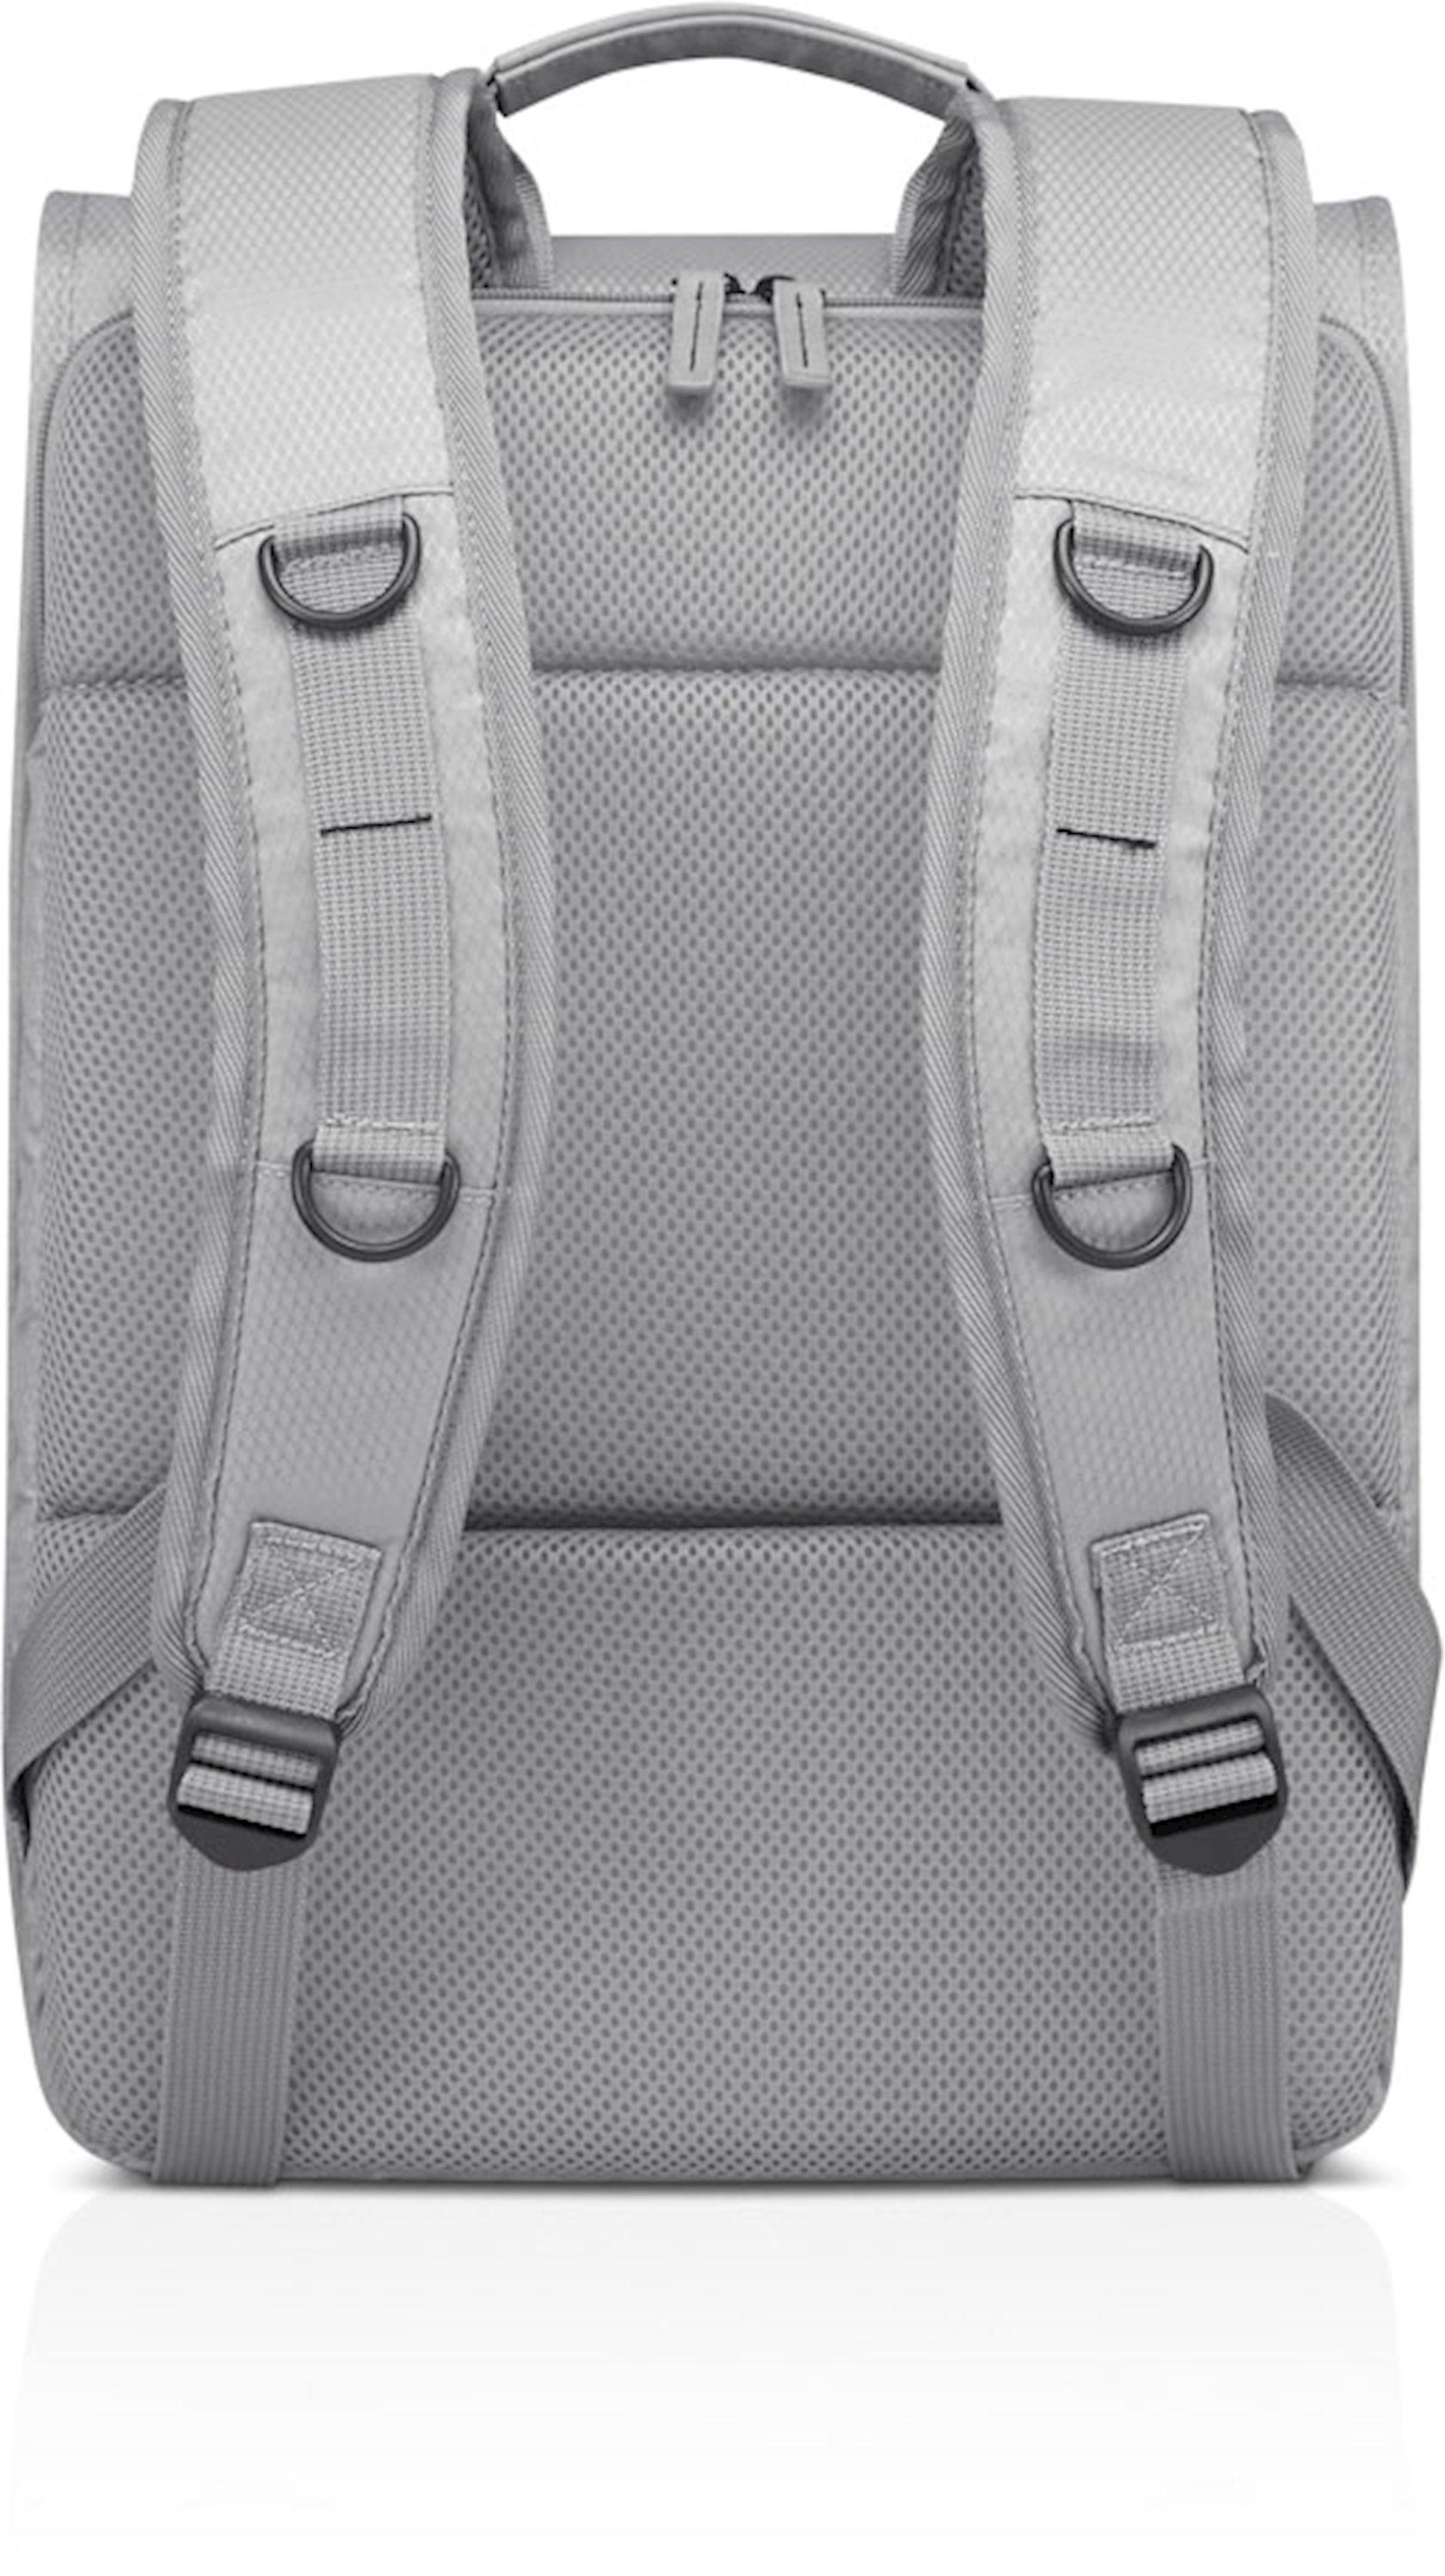 "Noutbuk üçün bel çantası Lenovo 15.6"" Urban Backpack 4X40V26080"